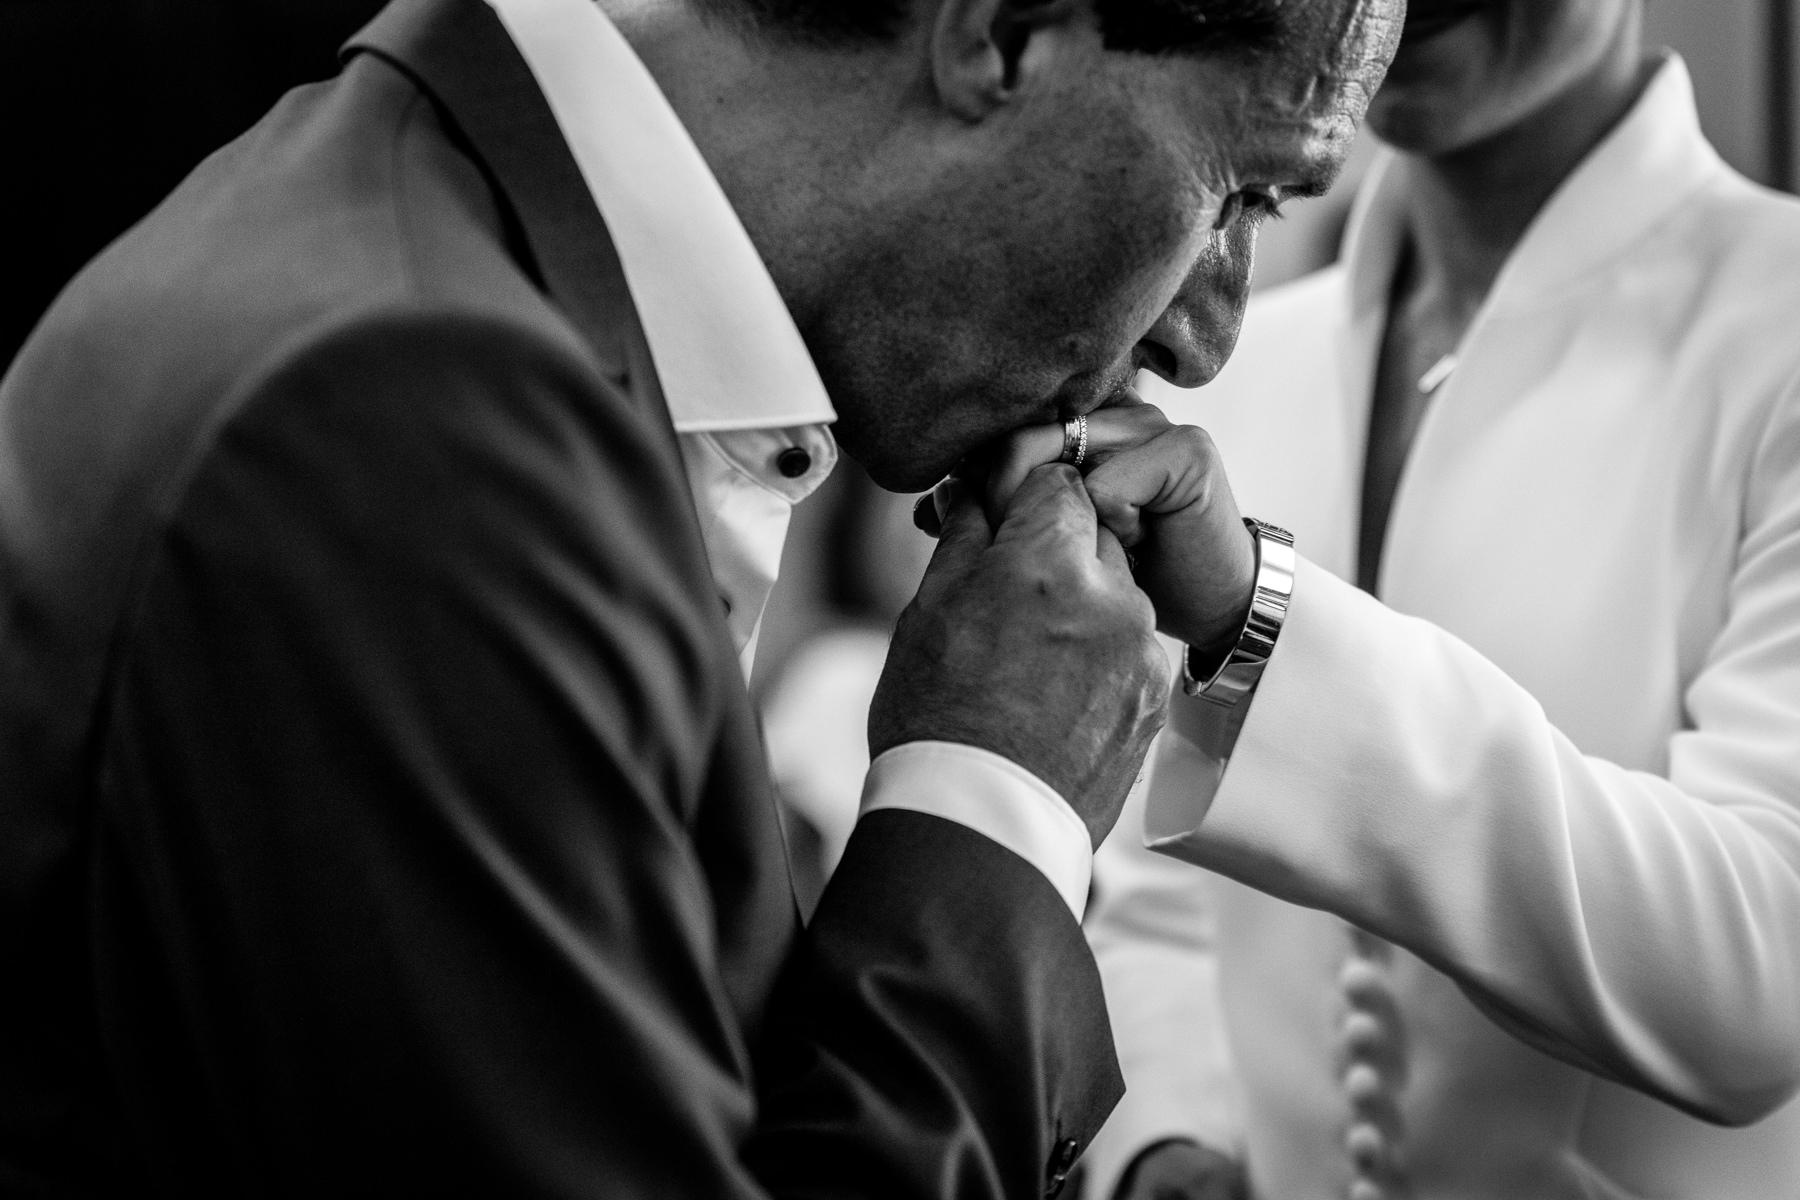 groom kissing bride hand wedding ring black&white image natural authentic documentary wedding photo bride groom couple beaverbrook surrey hills leatherhead register office wedding photographer